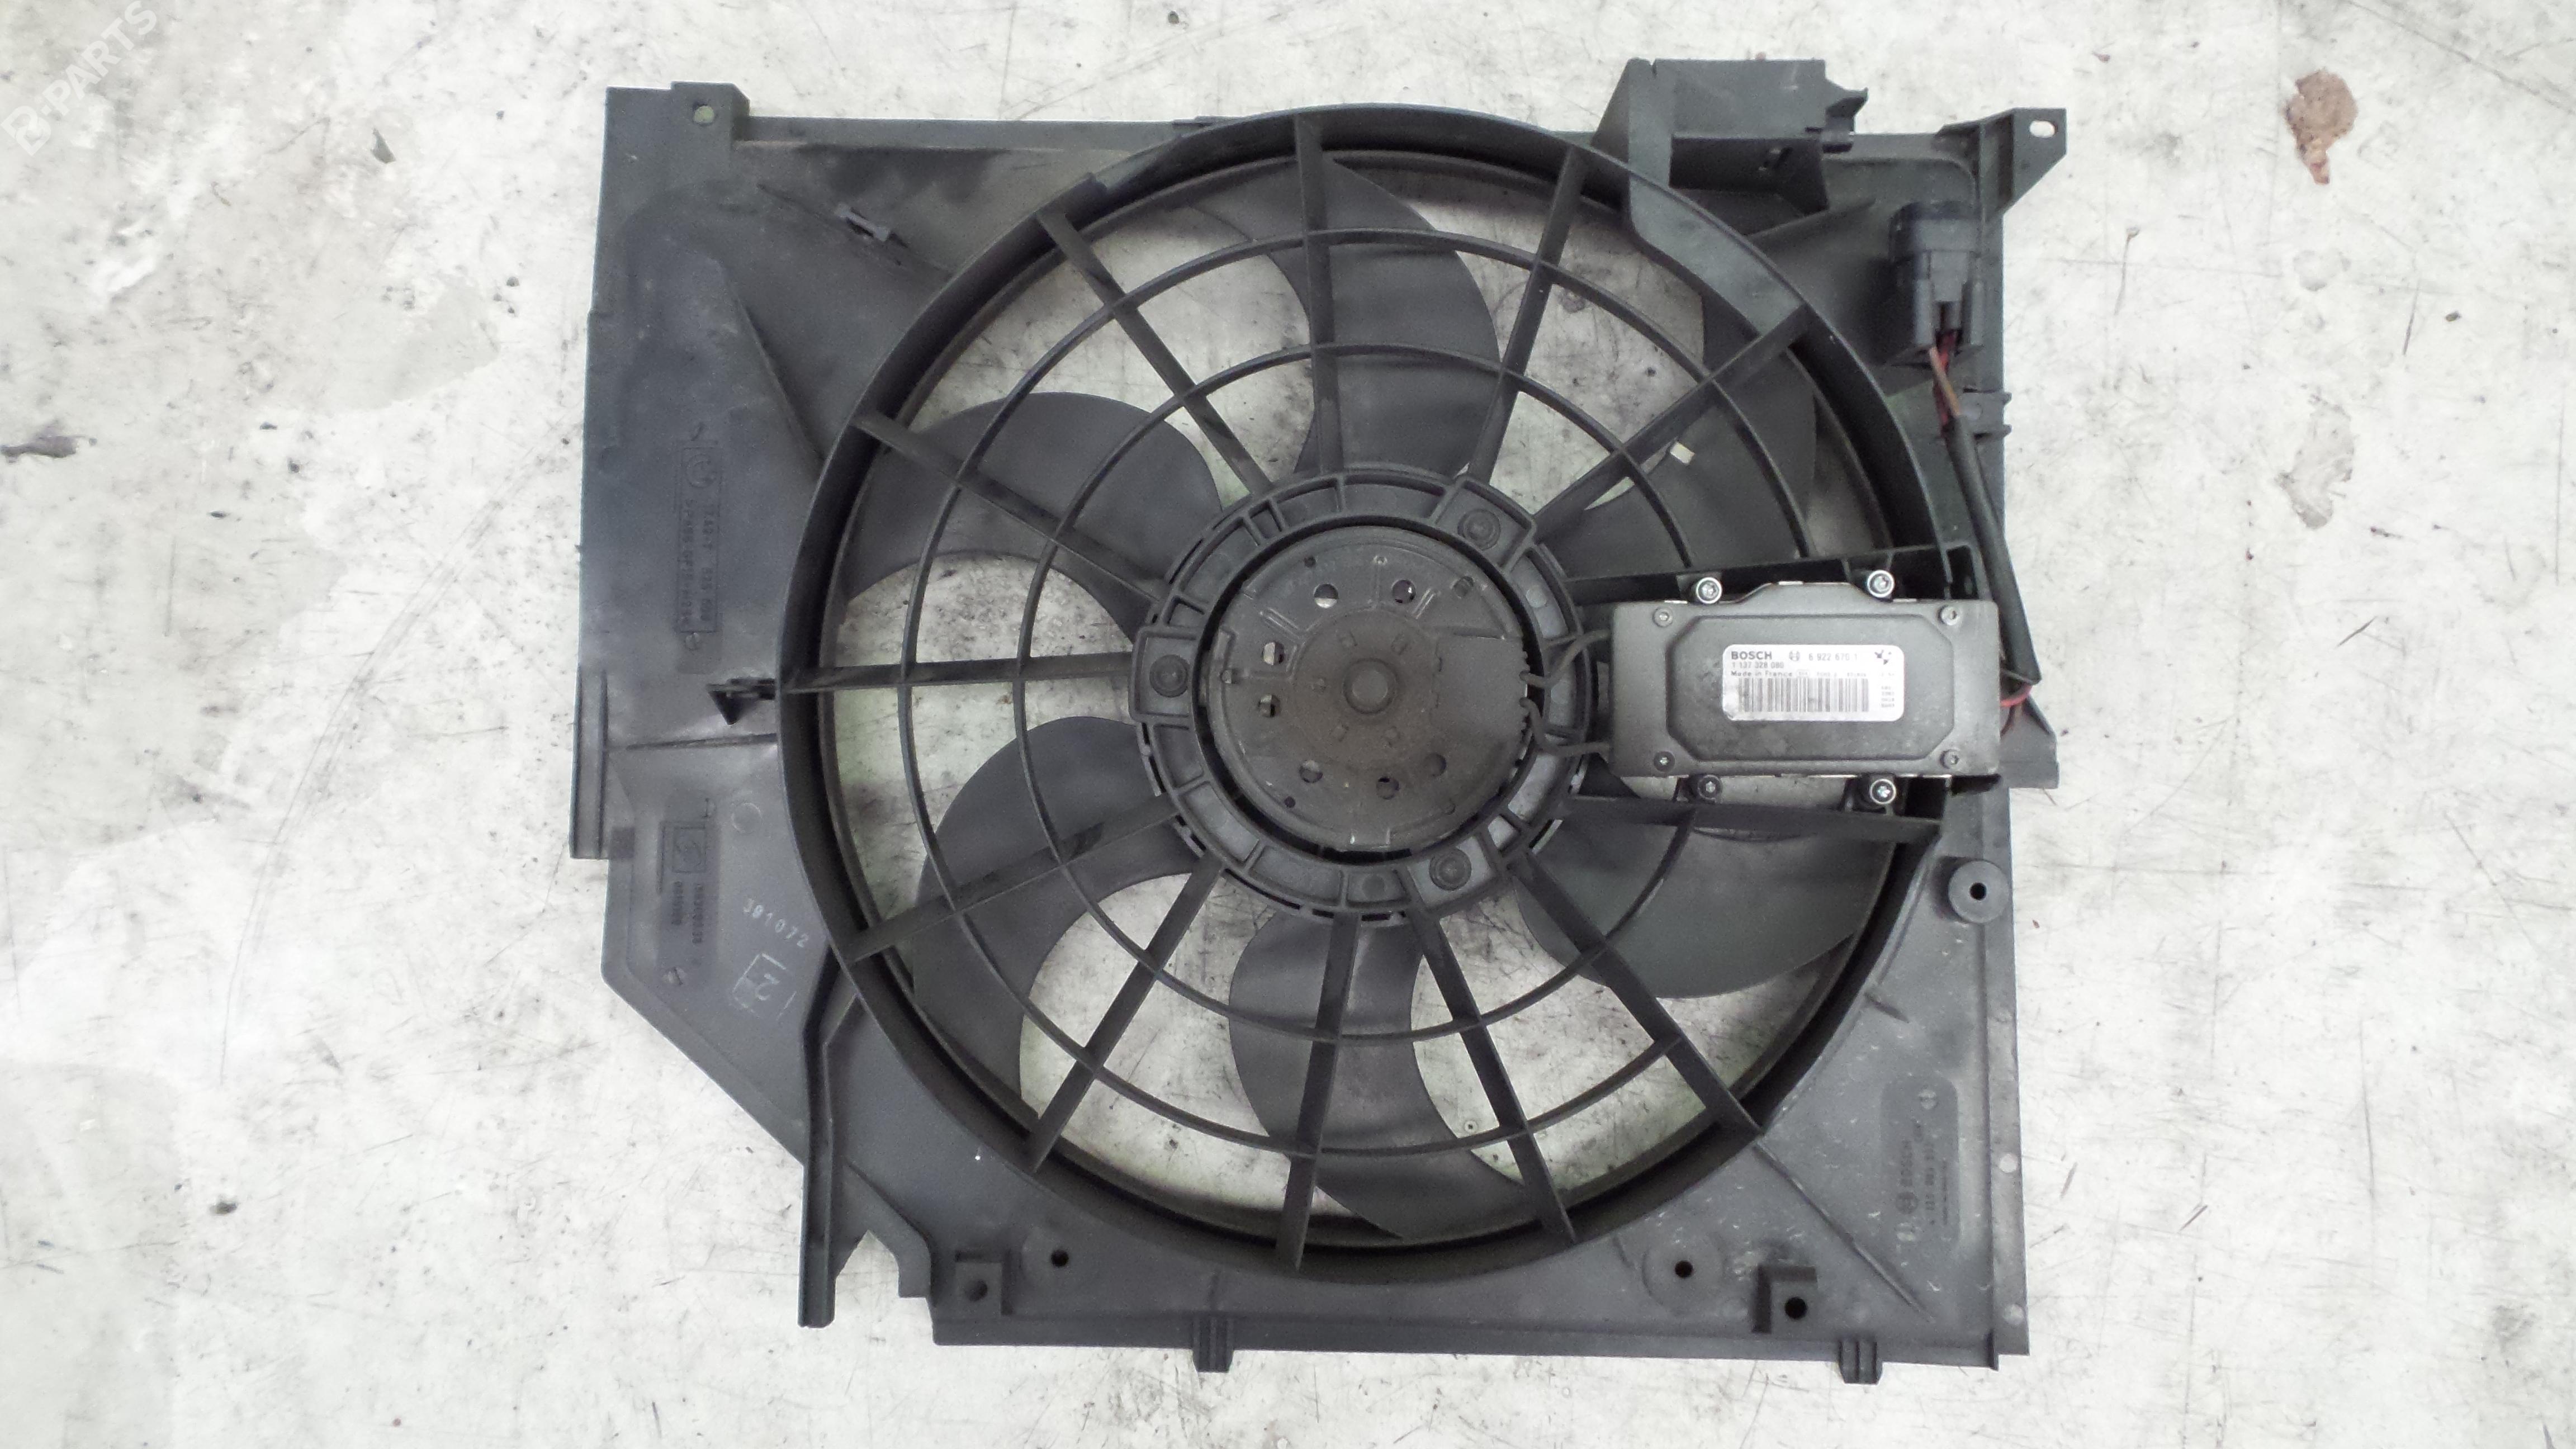 d sensors in equipment bmw series mishimoto parts performance radiator installed testing part hose rd engineering aluminum prototype r